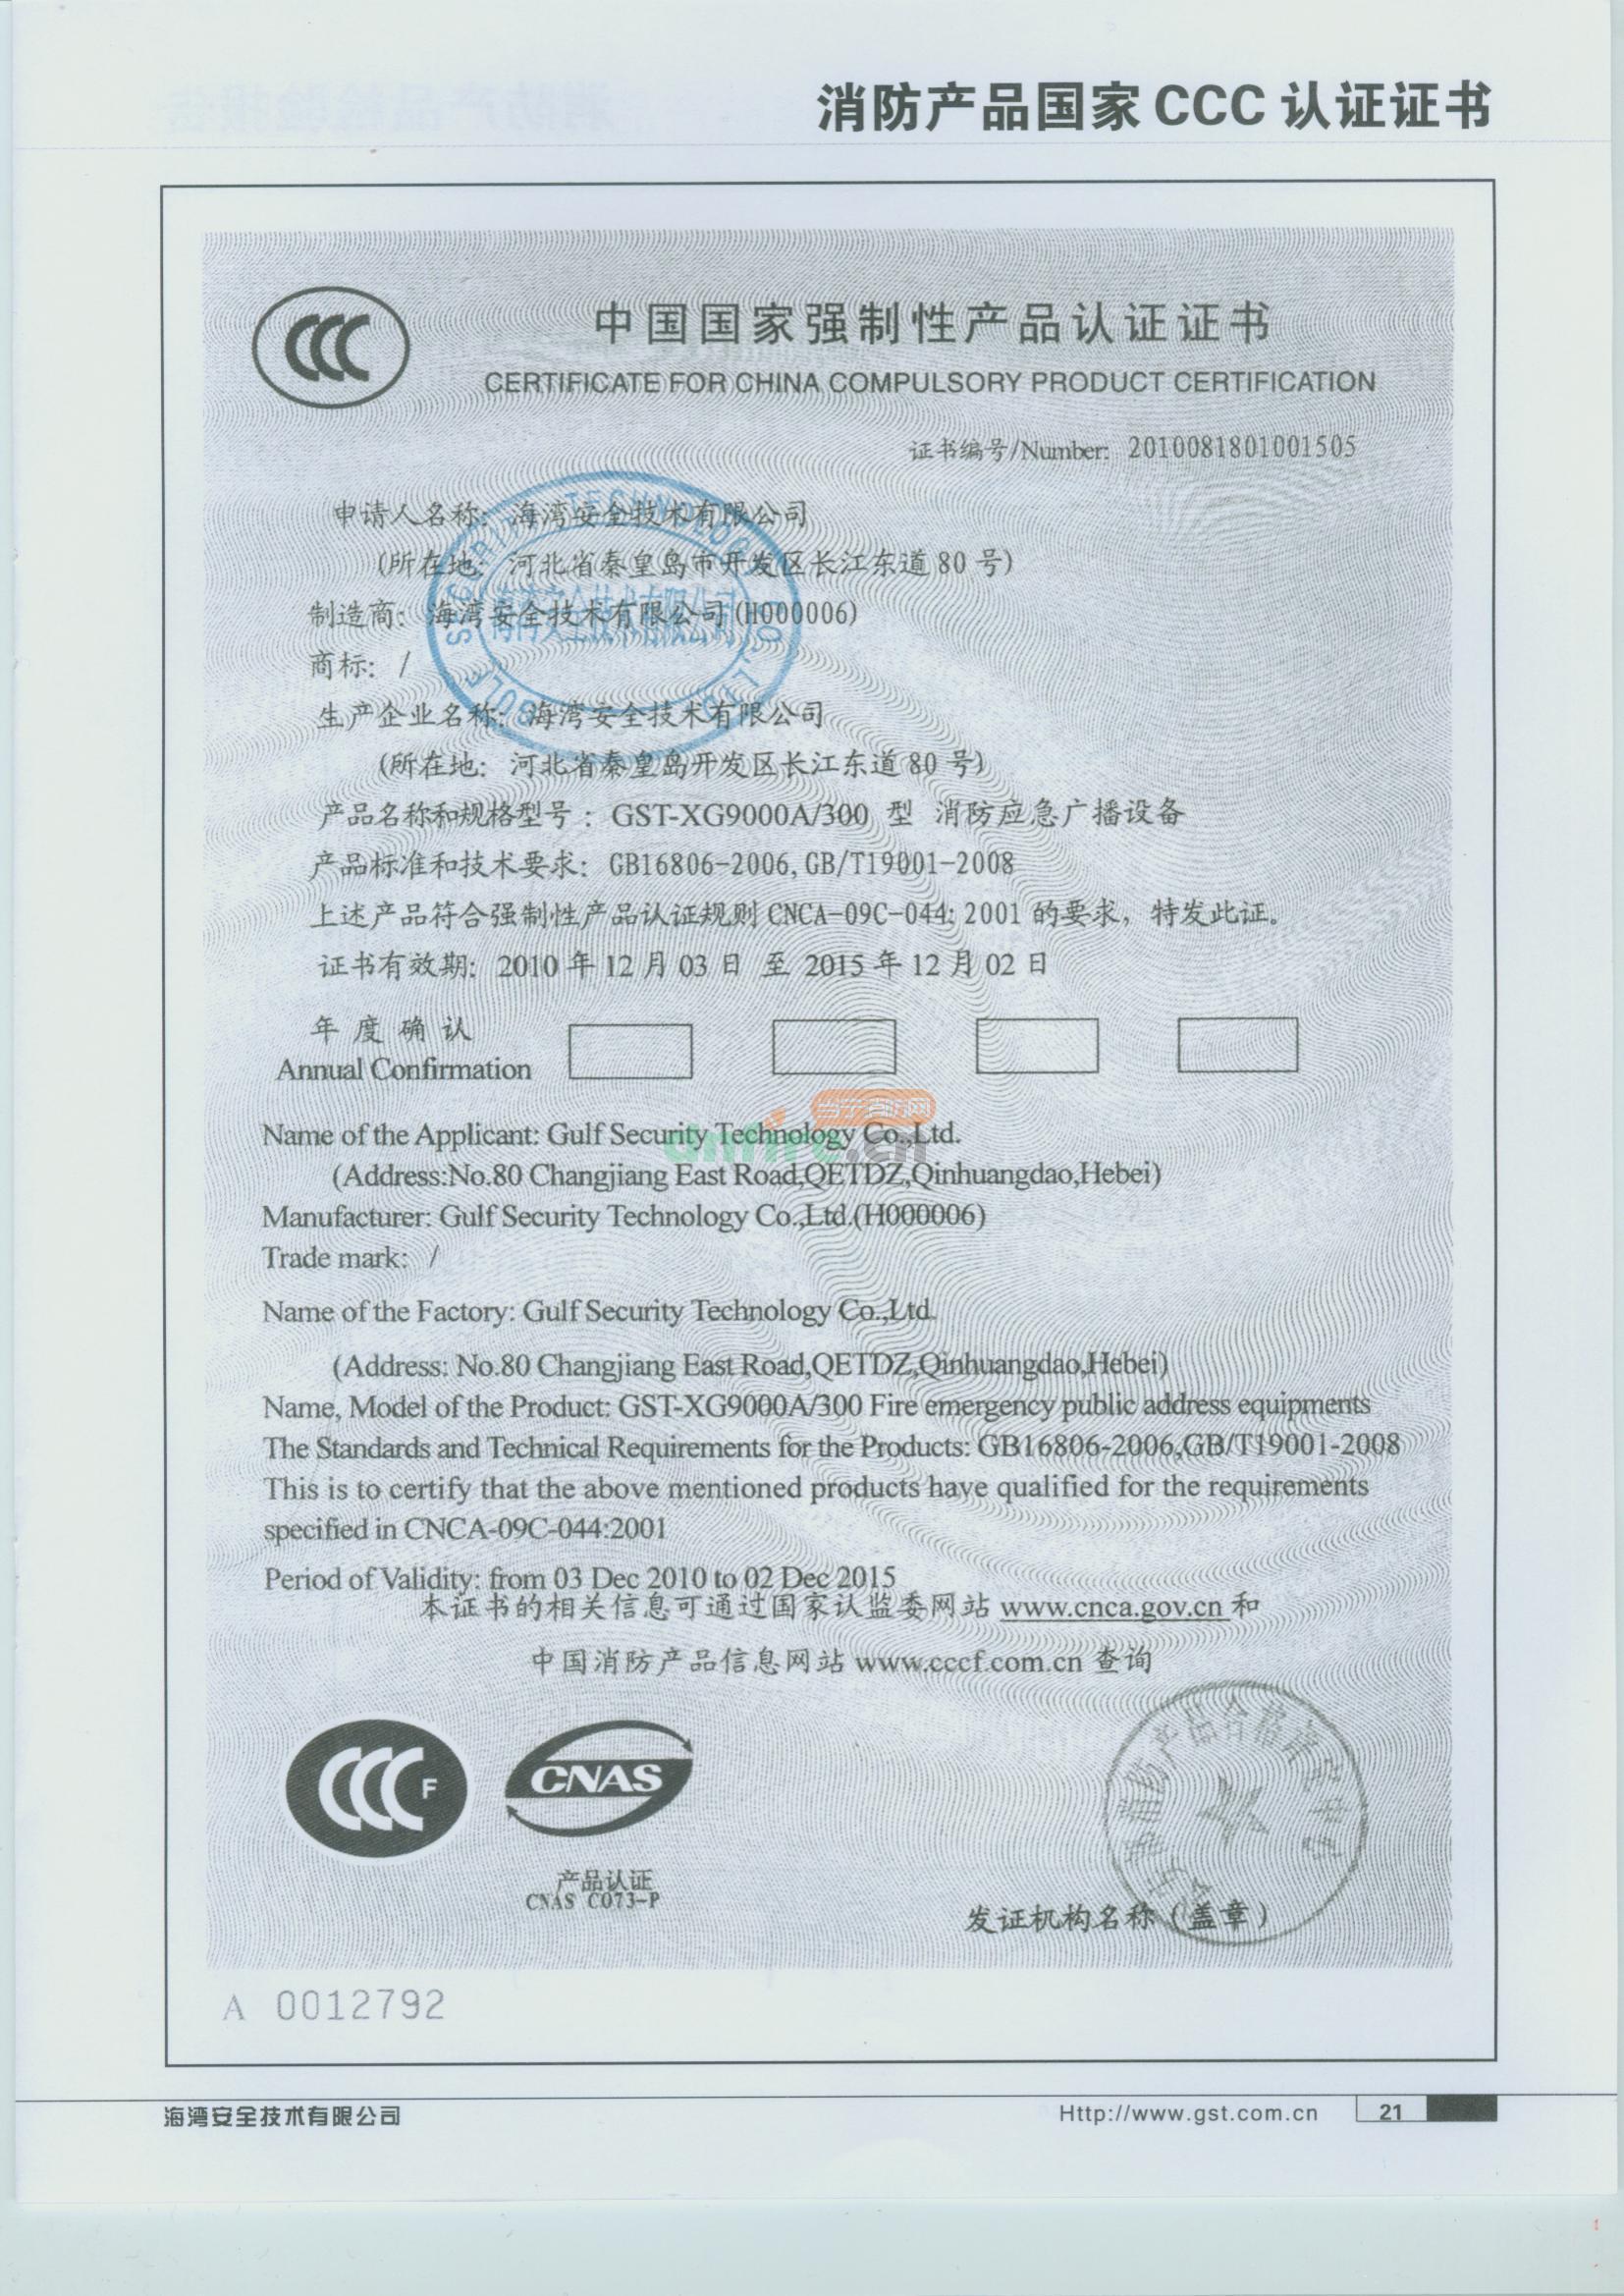 gst-xg9000a/300型消防应急广播设备3c认证证书_当宁.